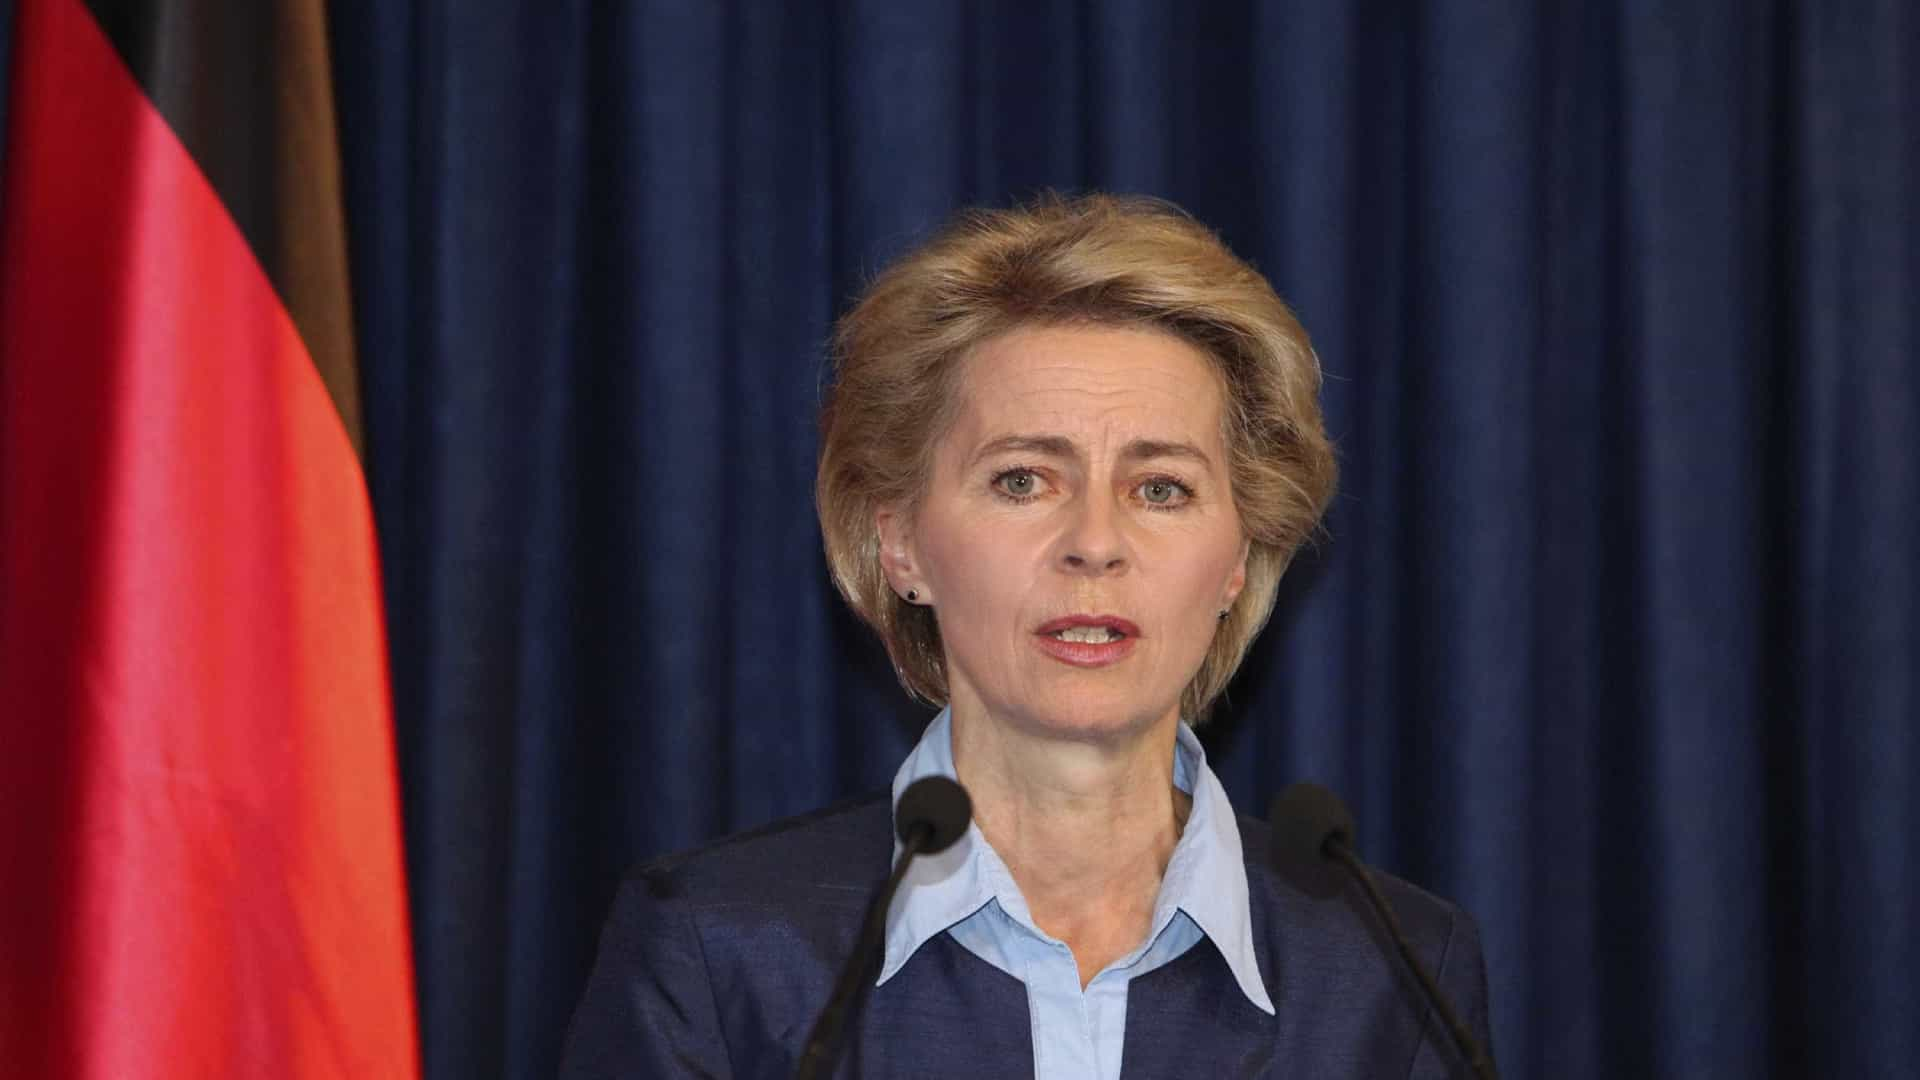 Ursula von der Leyen defende solidariedade na UE e resgates no mar